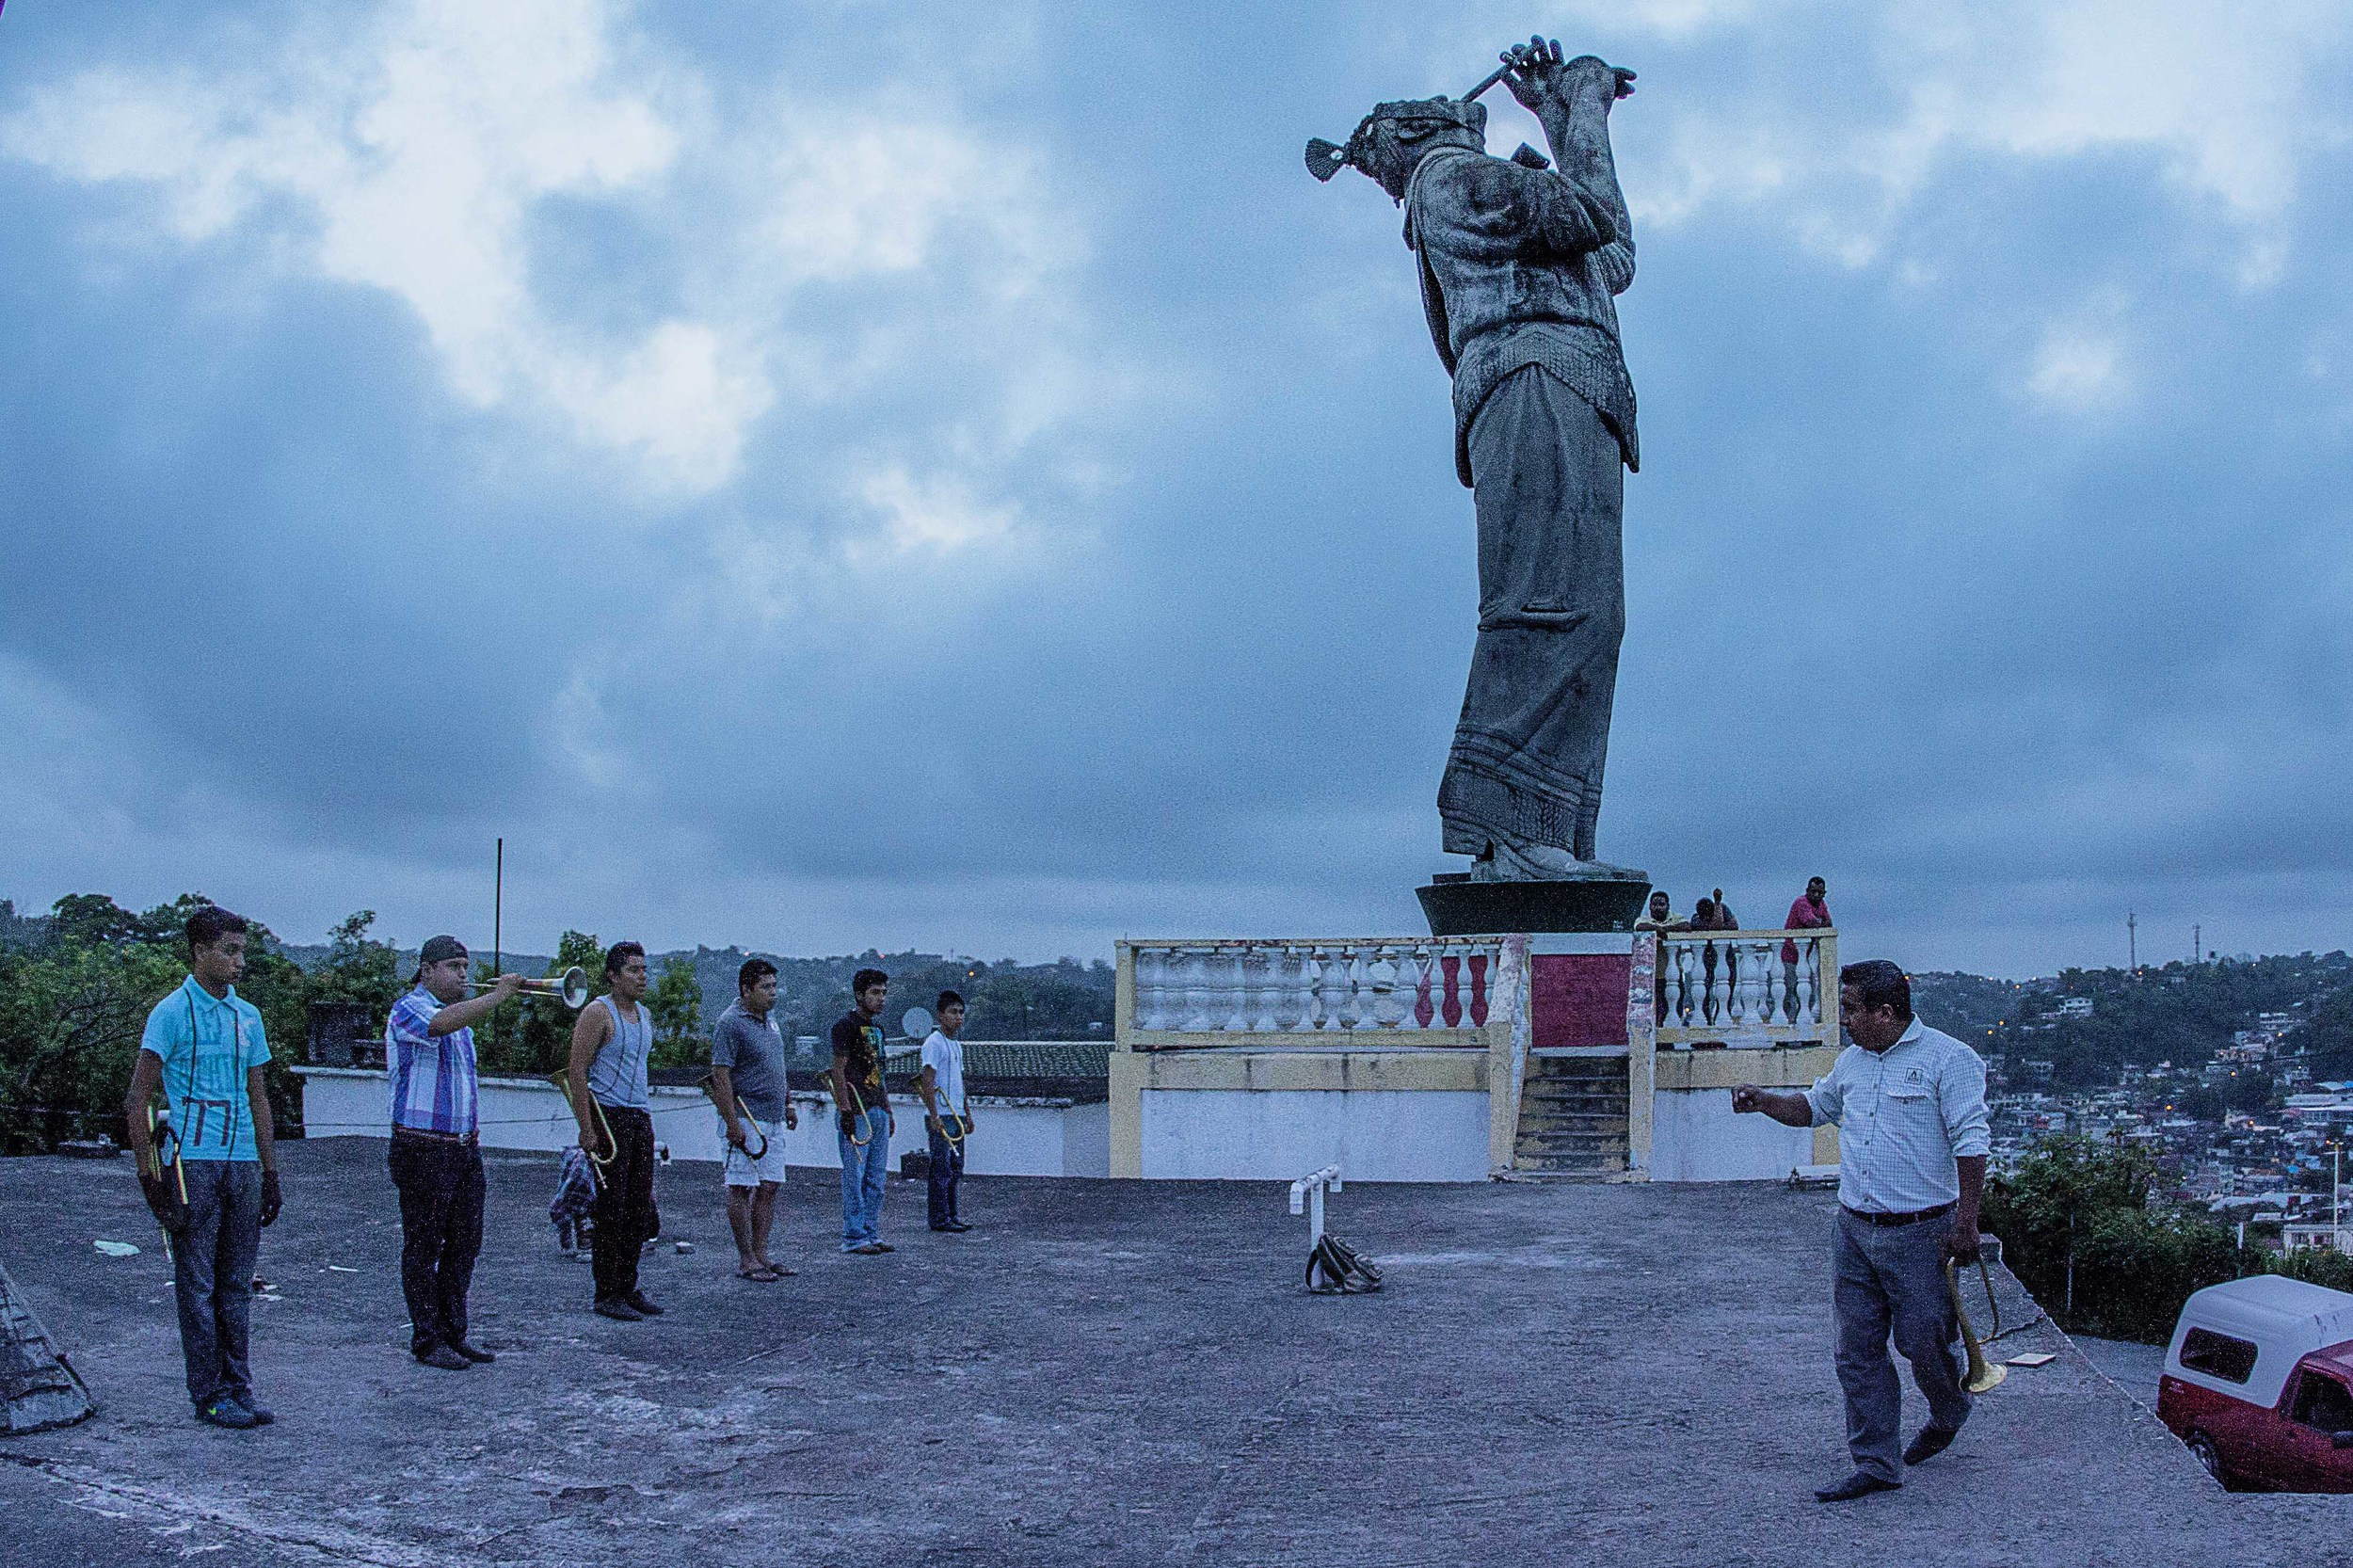 Day 110 - Papantla, Veracruz, Mexico